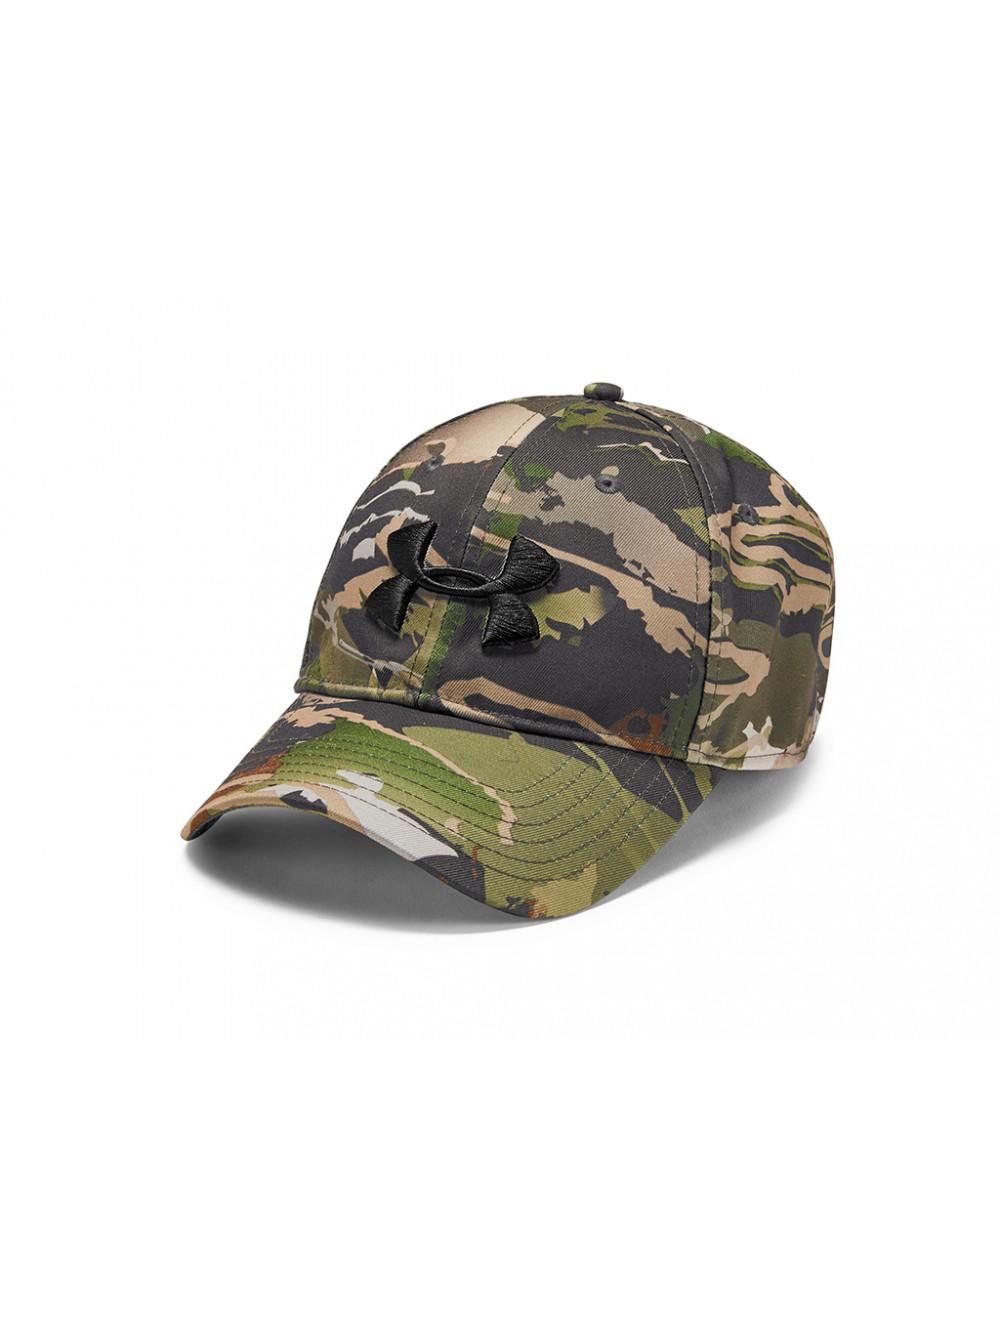 Pánská kšiltovka Under Armour Camo Cap army zelená